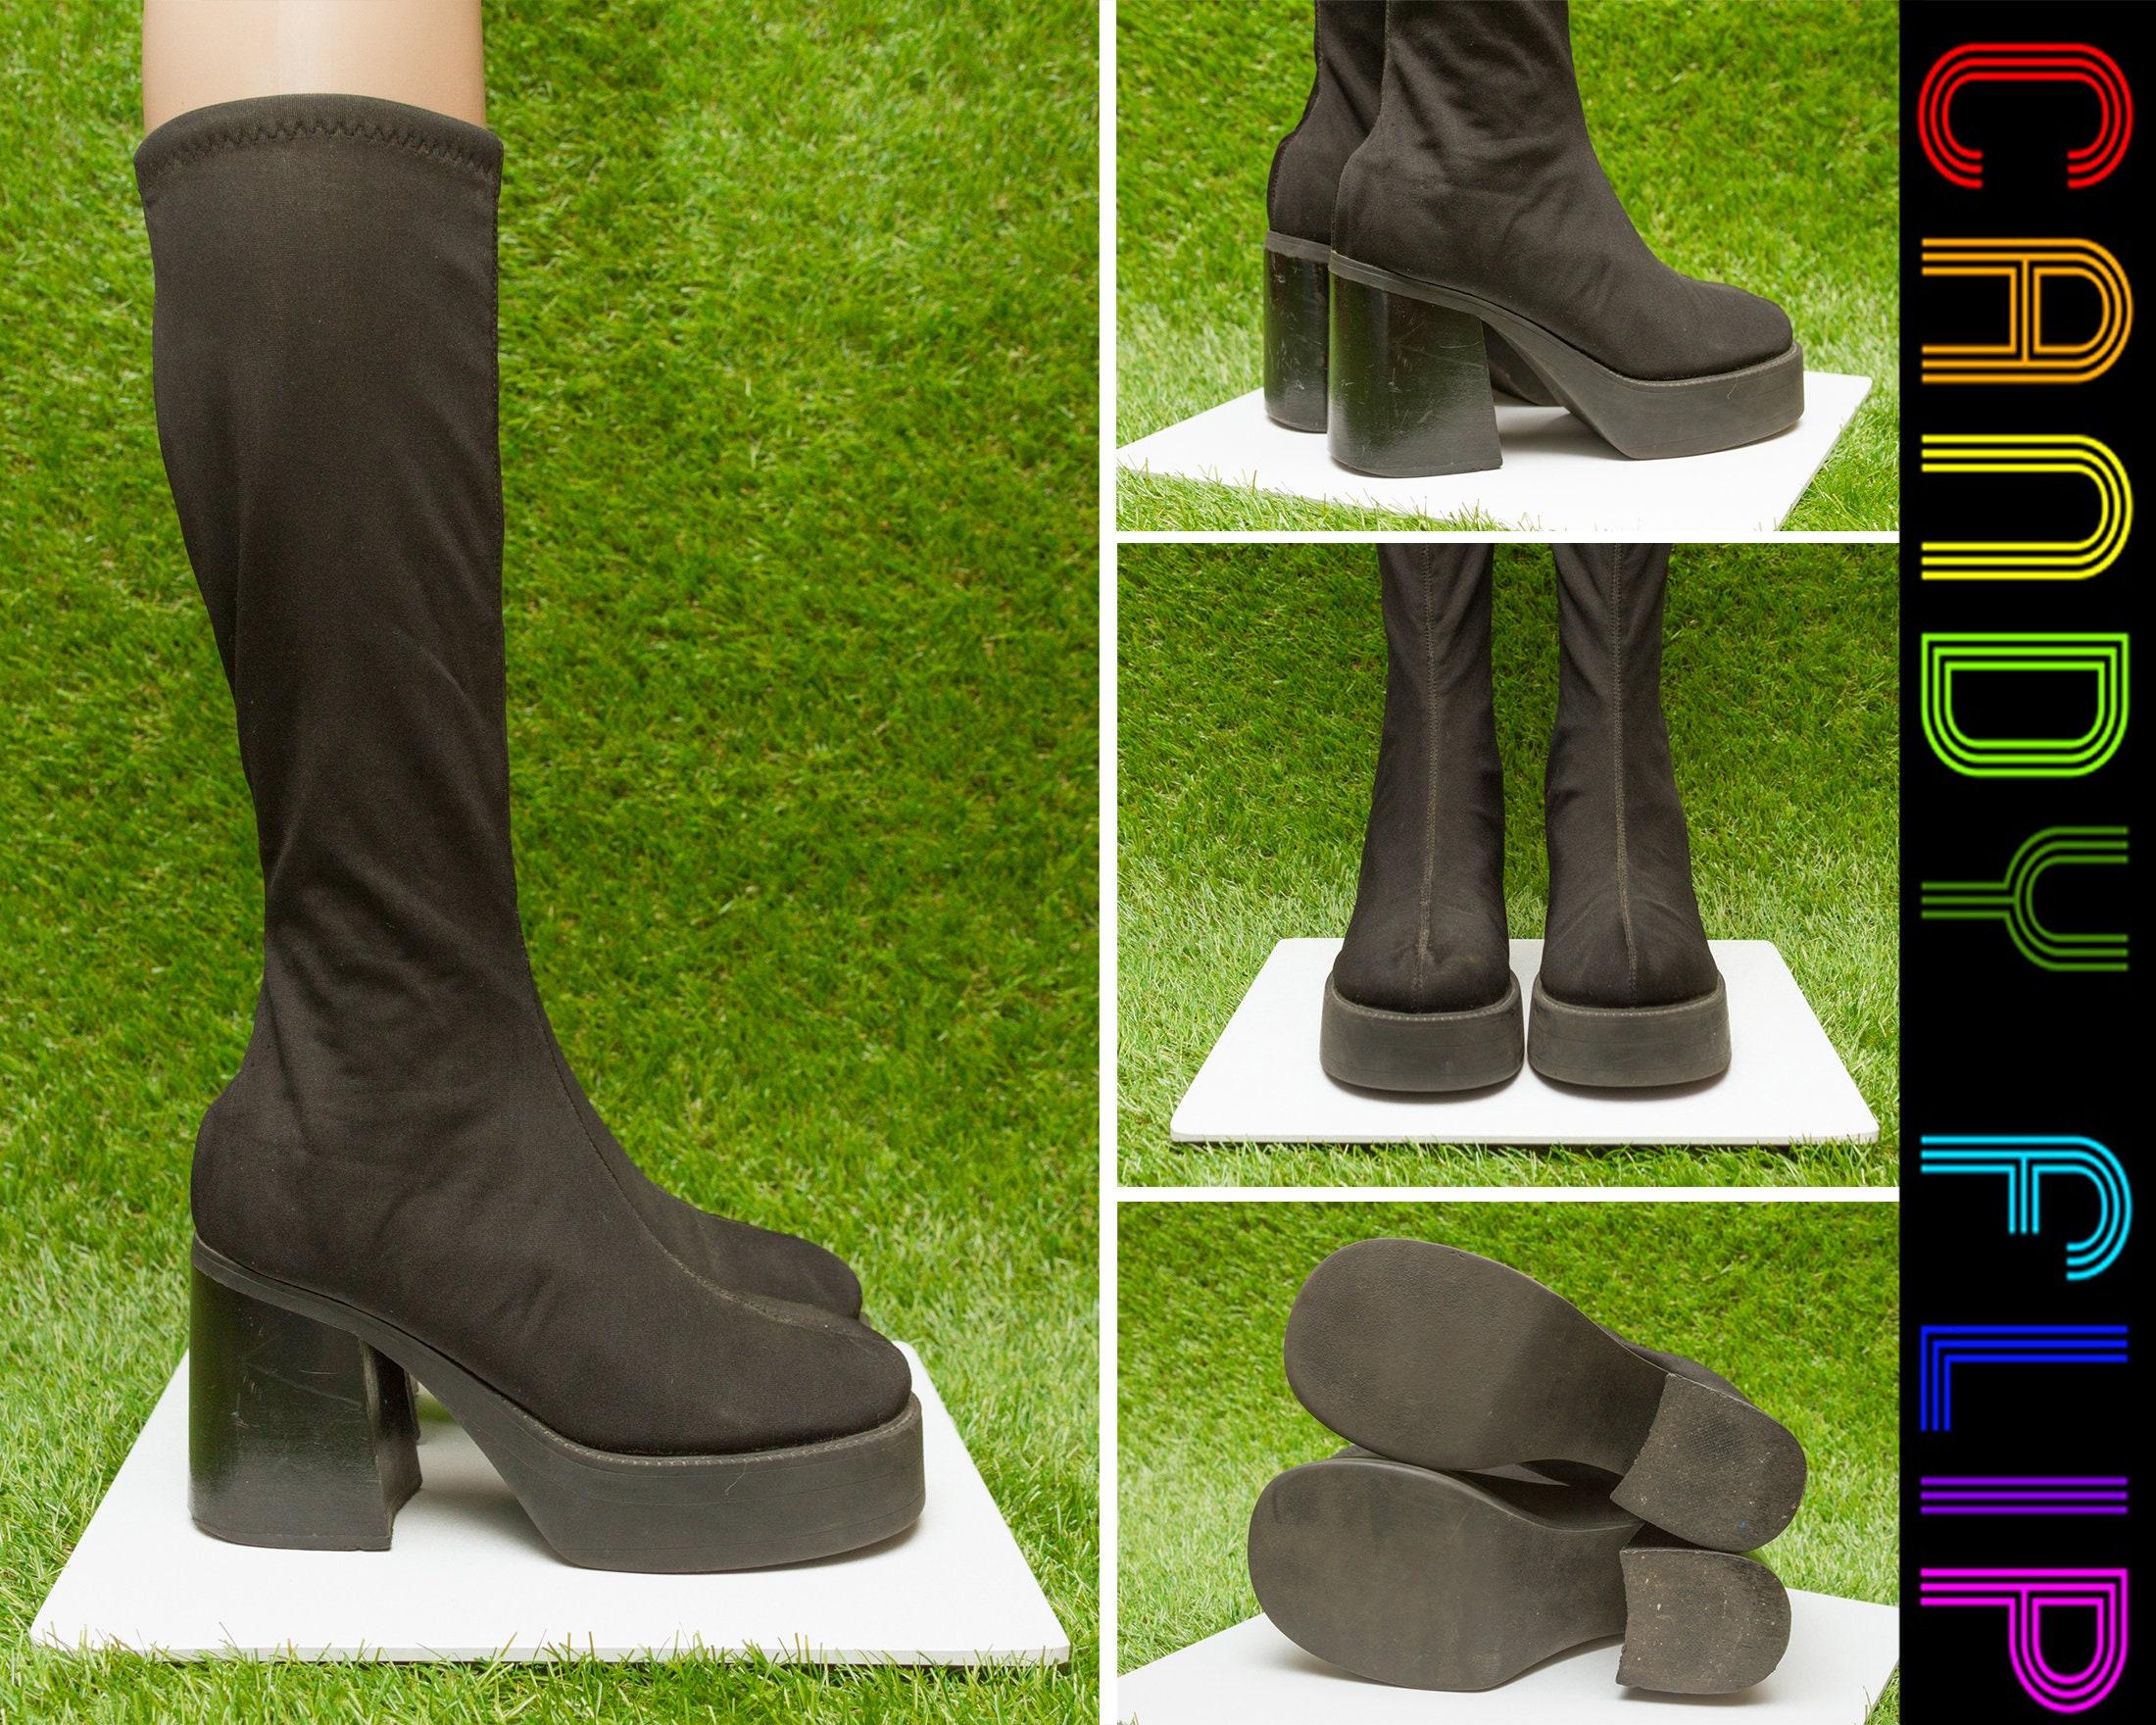 10f2e7f722f2 Vintage 90s Bongo Black Chunky Platform Stretch Elastic Club Kid Thick  Cuban Heel Knee Pull On Tall Shaft Go Go Dancing Platform Boots 7